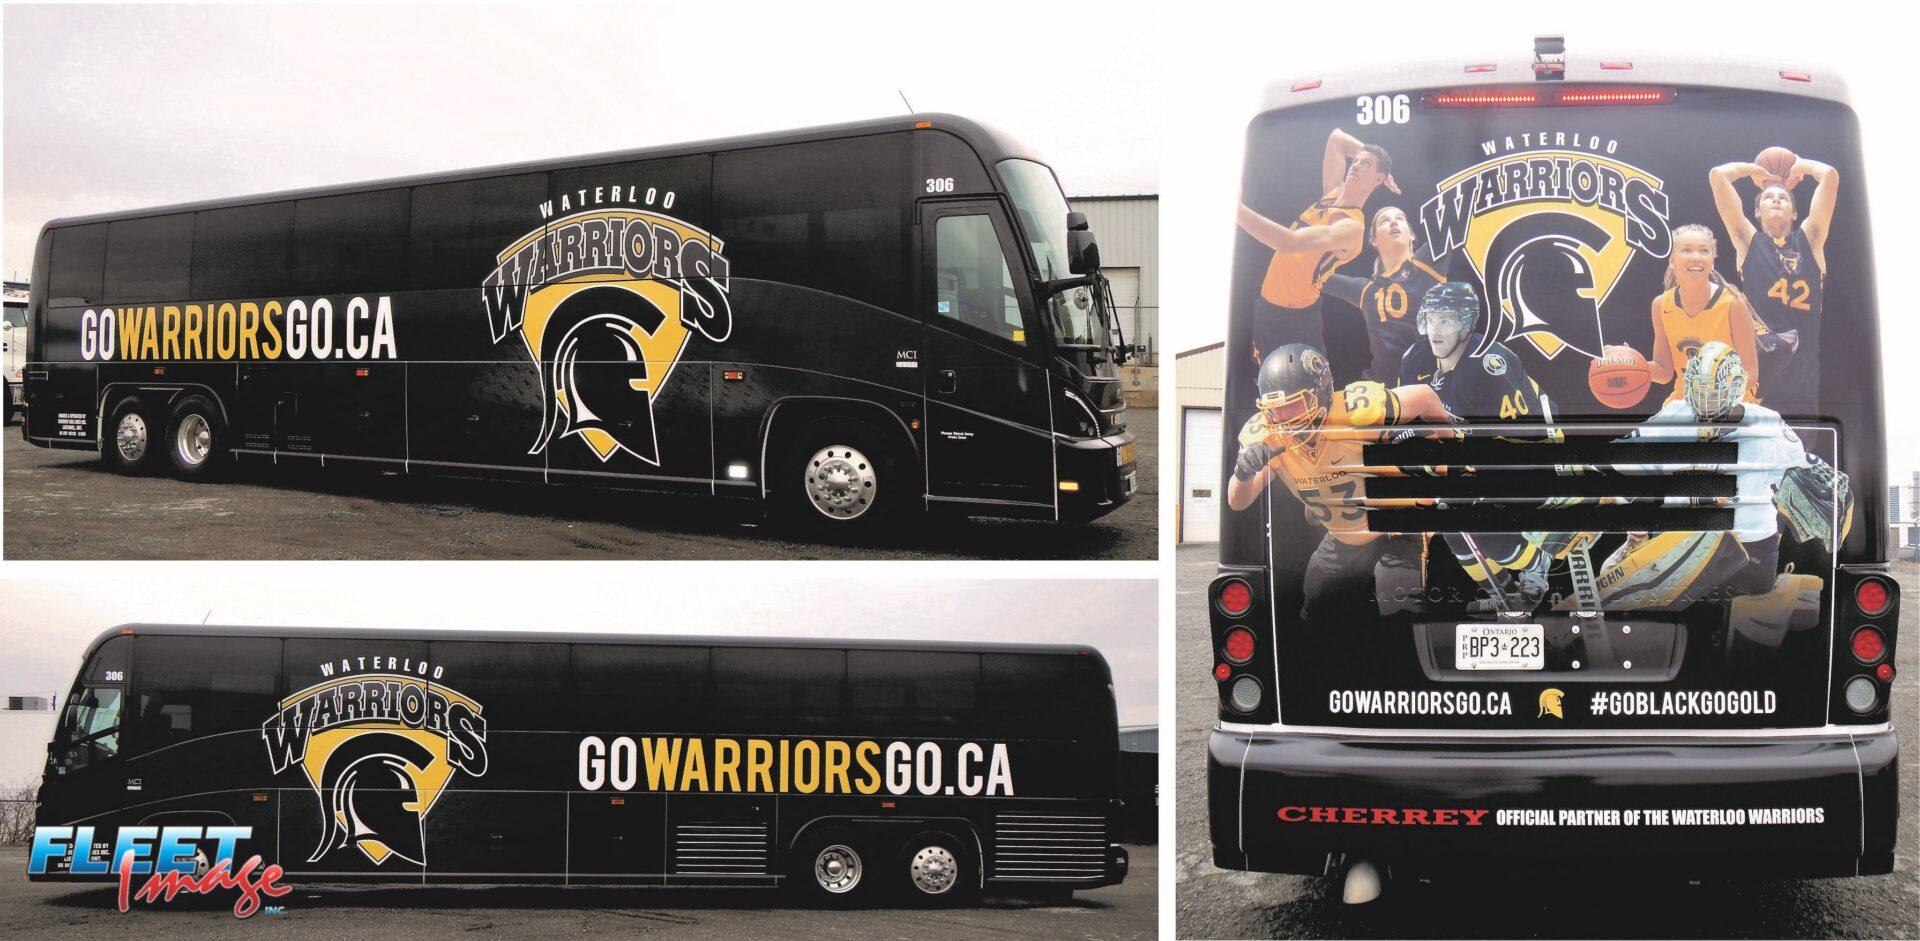 Waterloo Warriors decal sticker on a truck